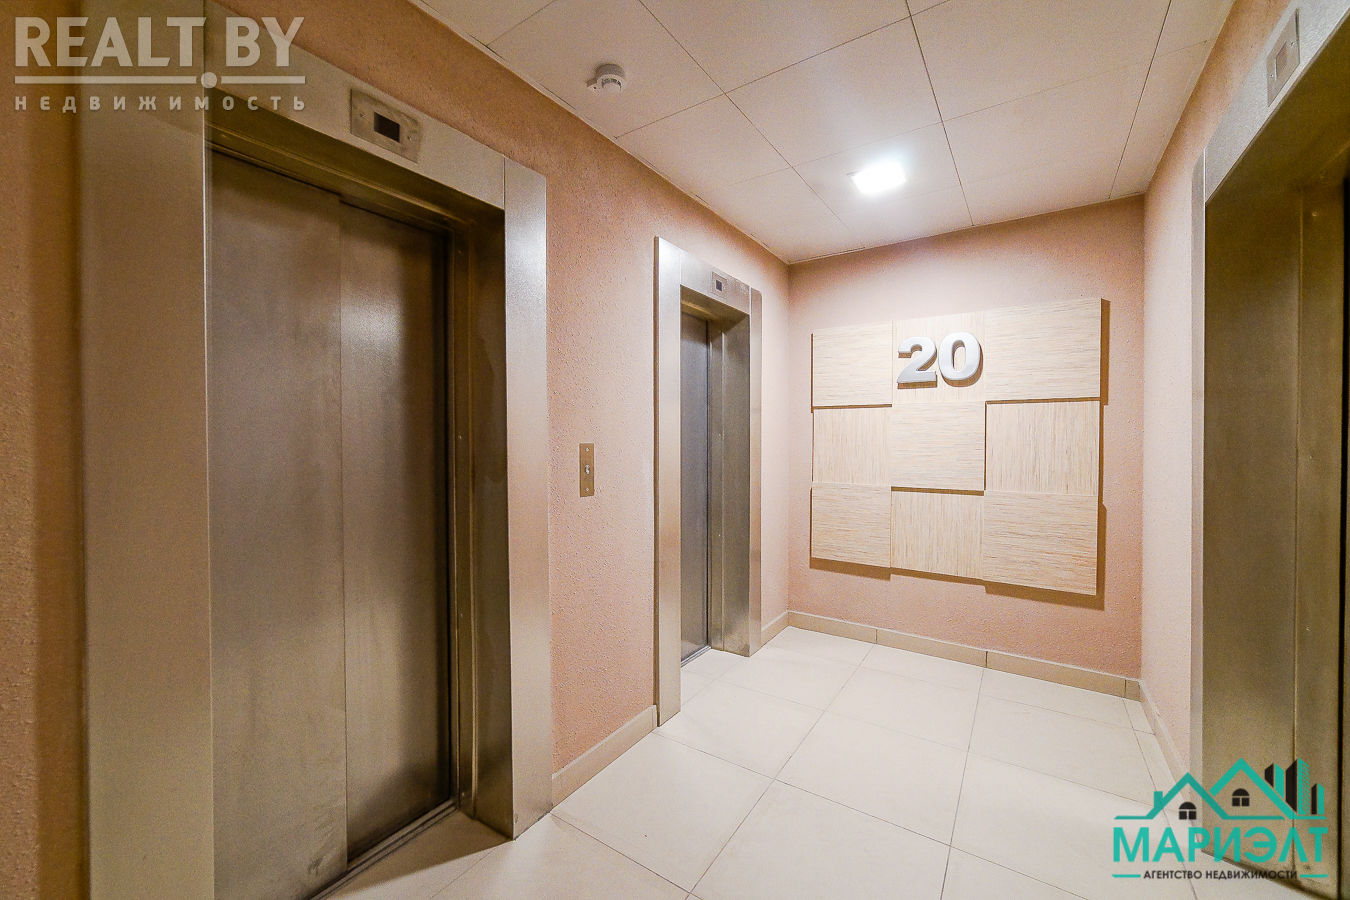 Продается 4-х комнатная квартира, ул. Сторожовская д.6 - фото №43